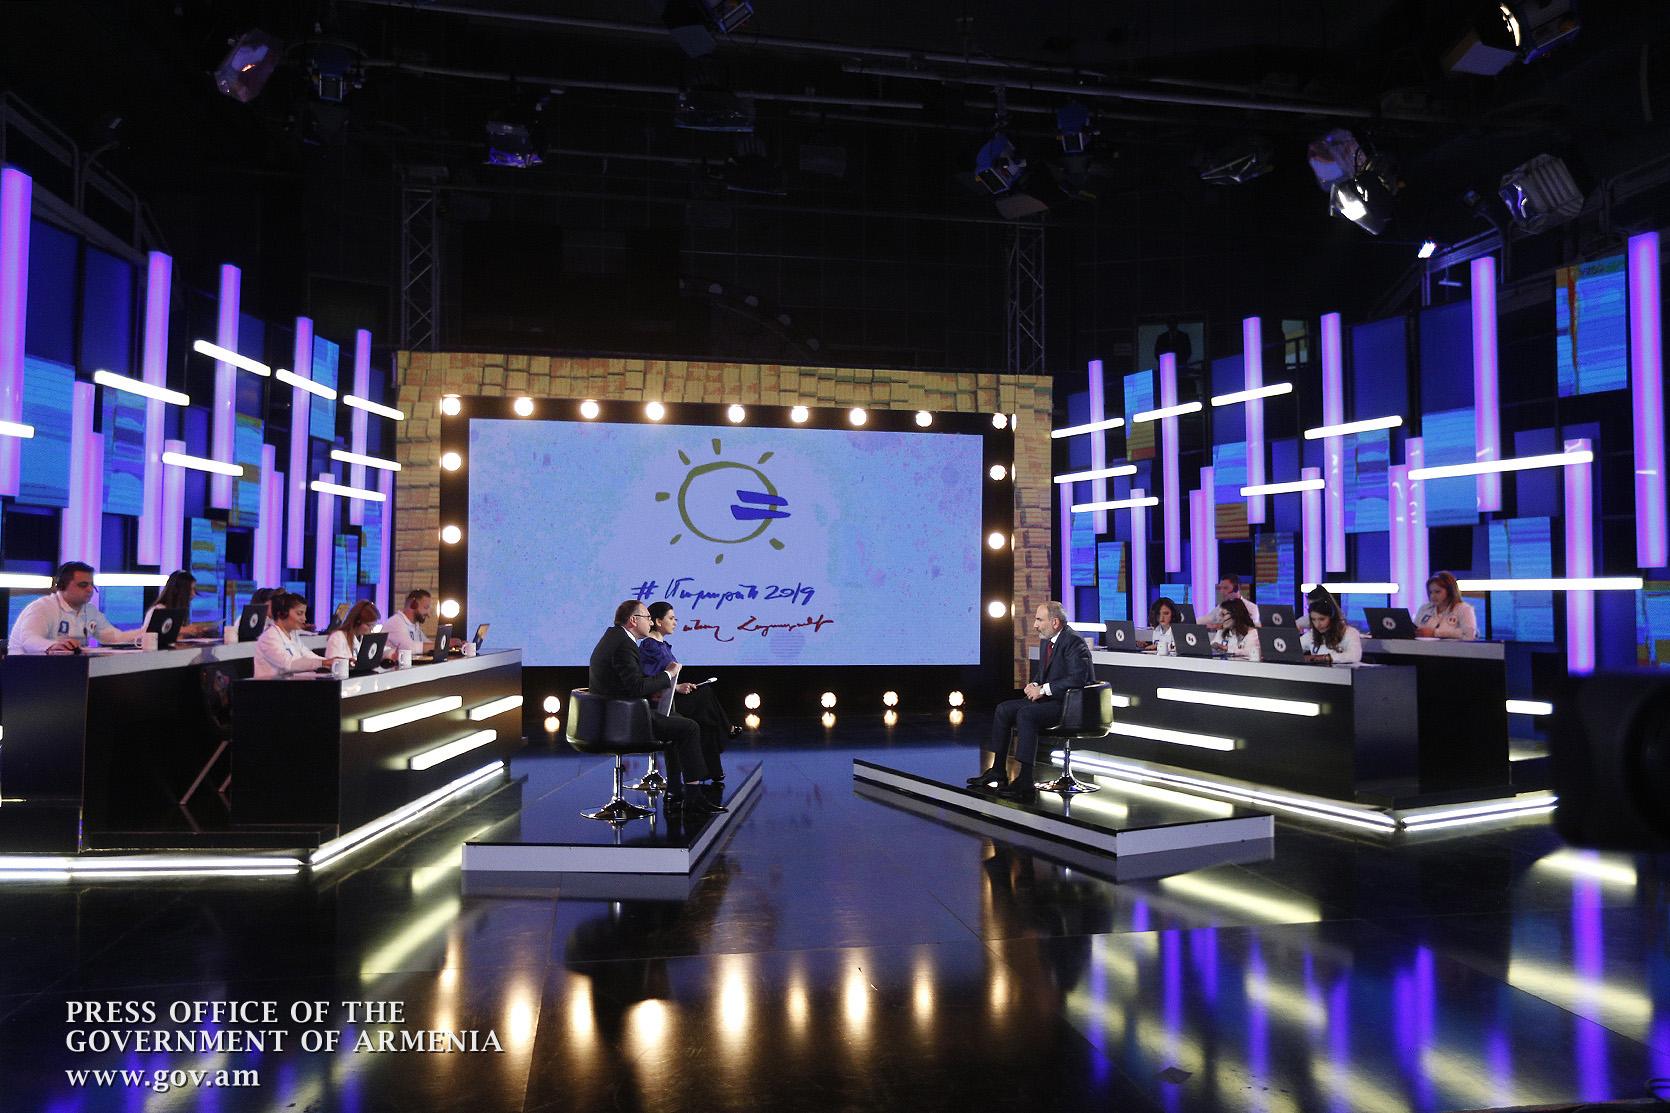 telethon, Hayastan All-Armenian Fund, Nikol Pashinyan, Kim Kardashian, Serj Tankyan, Alexis Ohanyan, Nagorno-Karabakh, Artsakh, donations, corruption scandal,